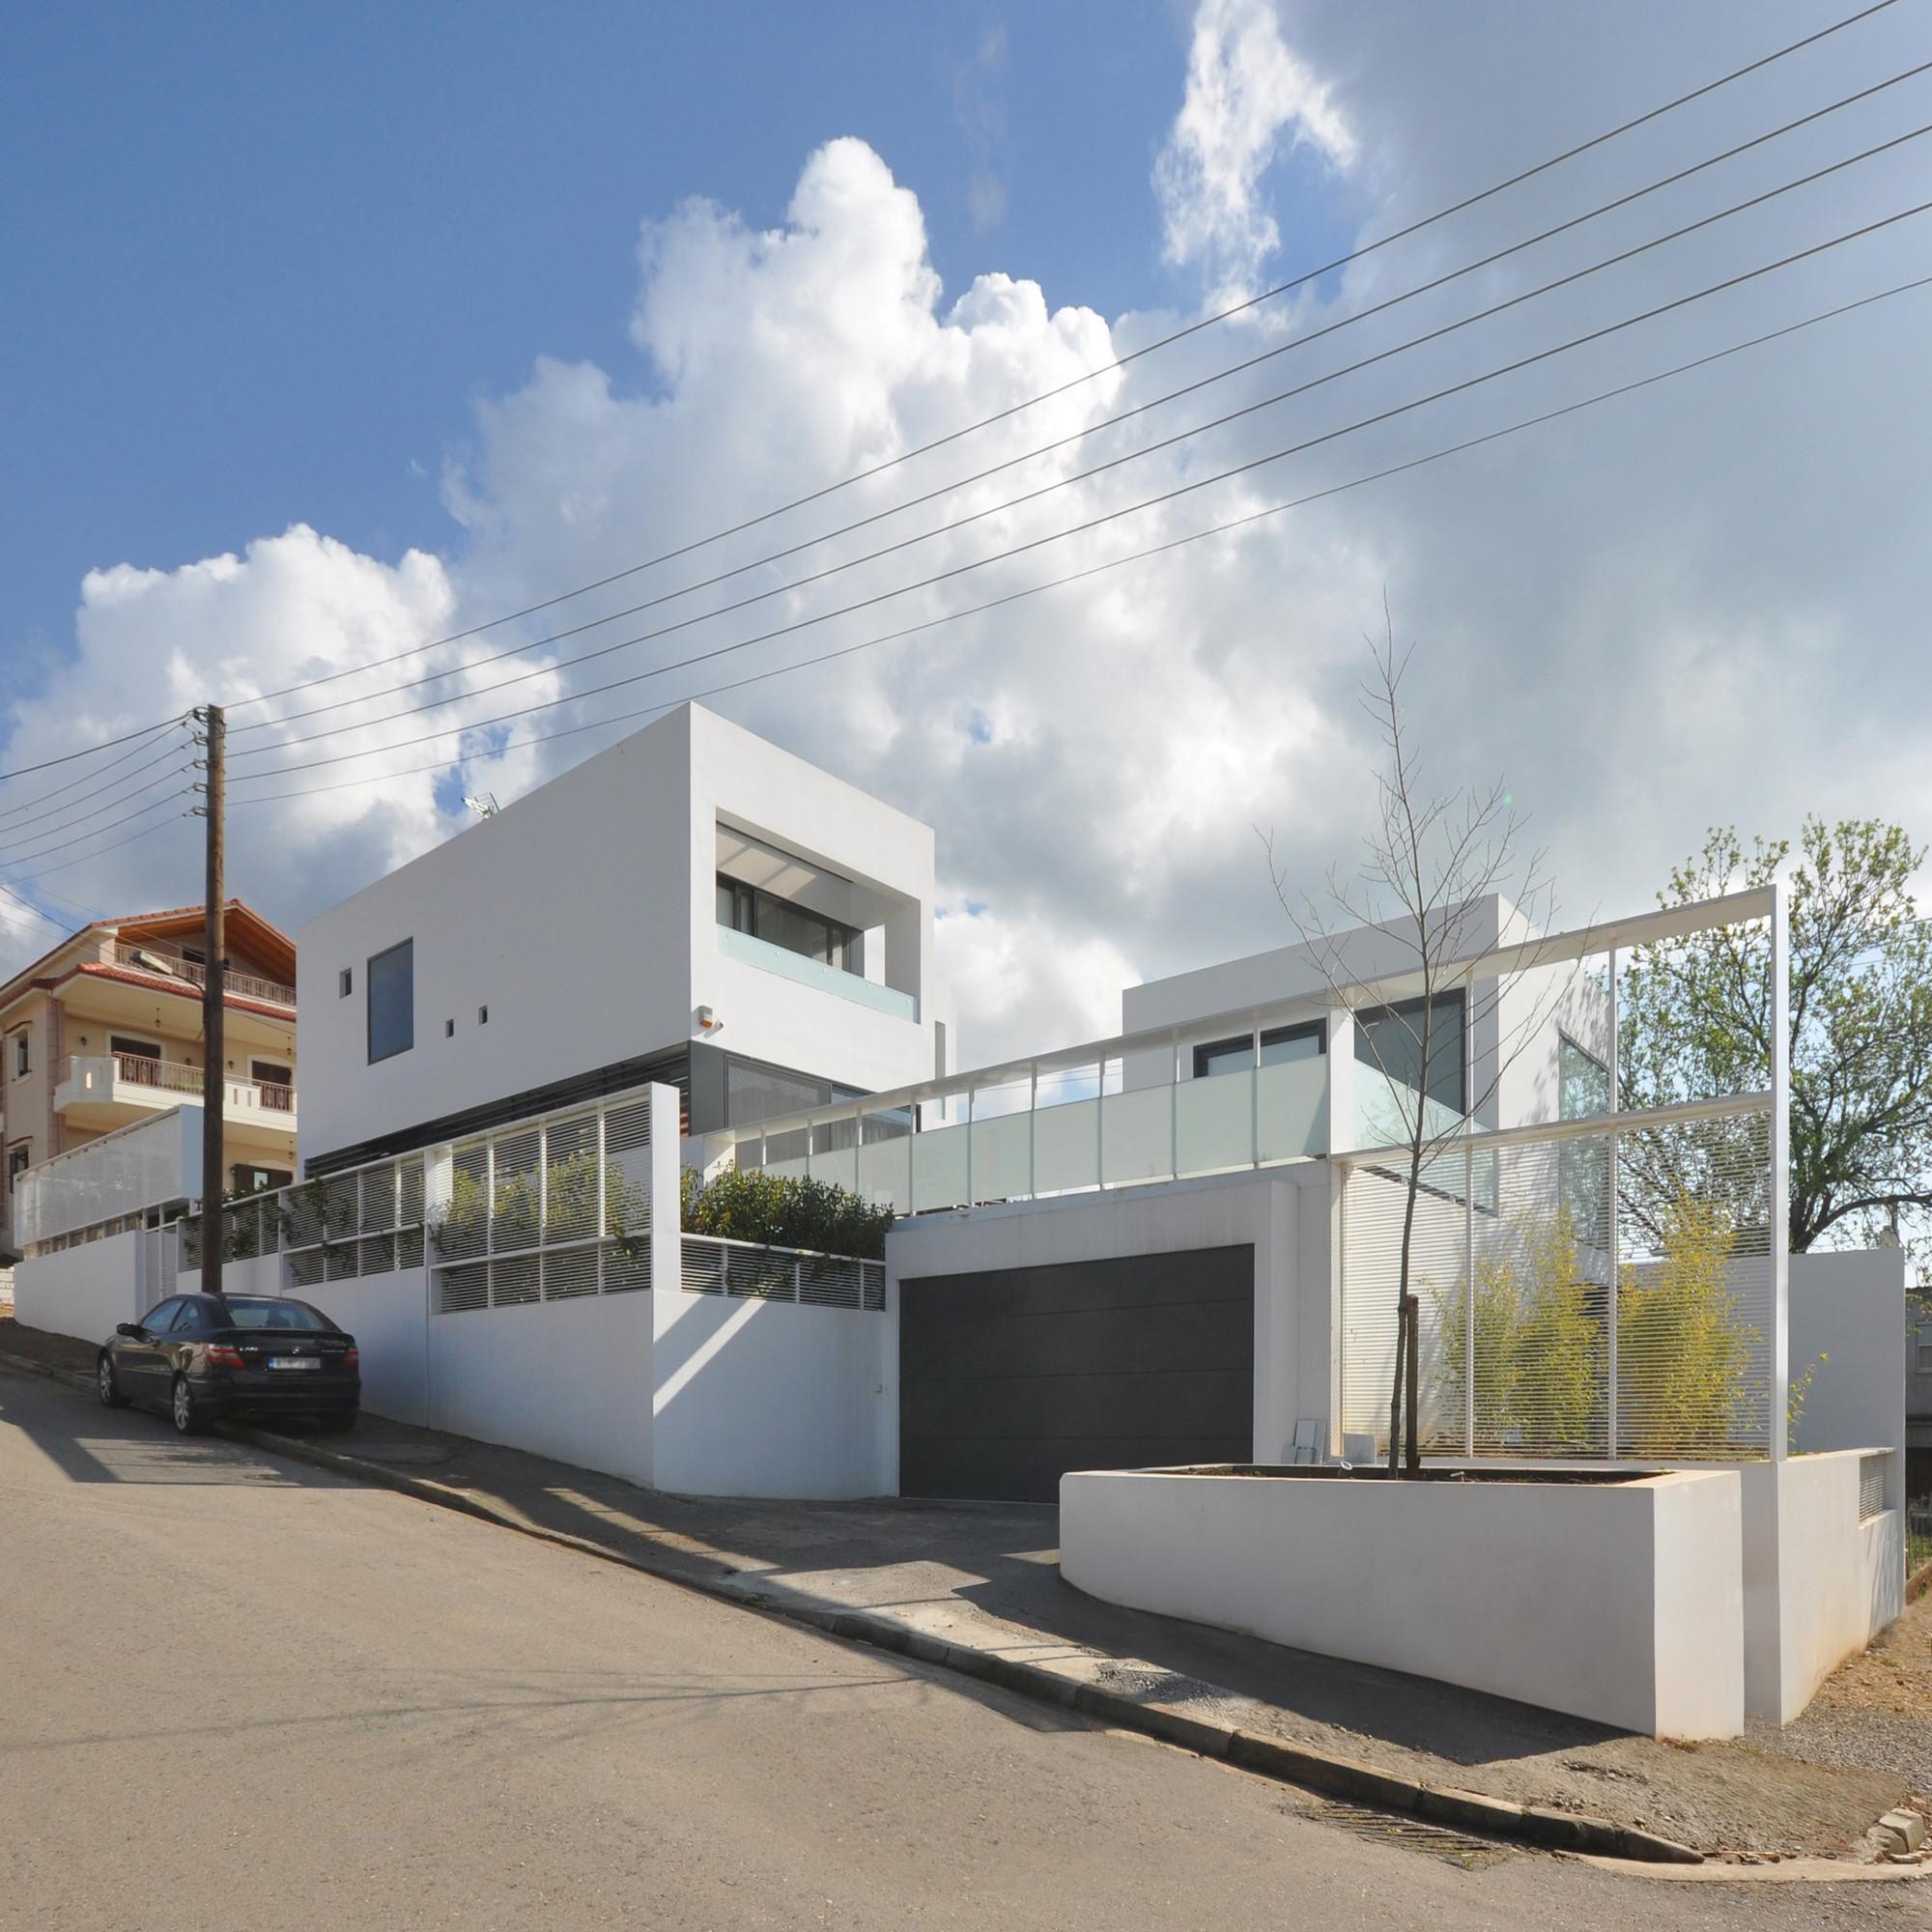 House in Agrinio / John Karahalios, Courtesy of John Karahalios